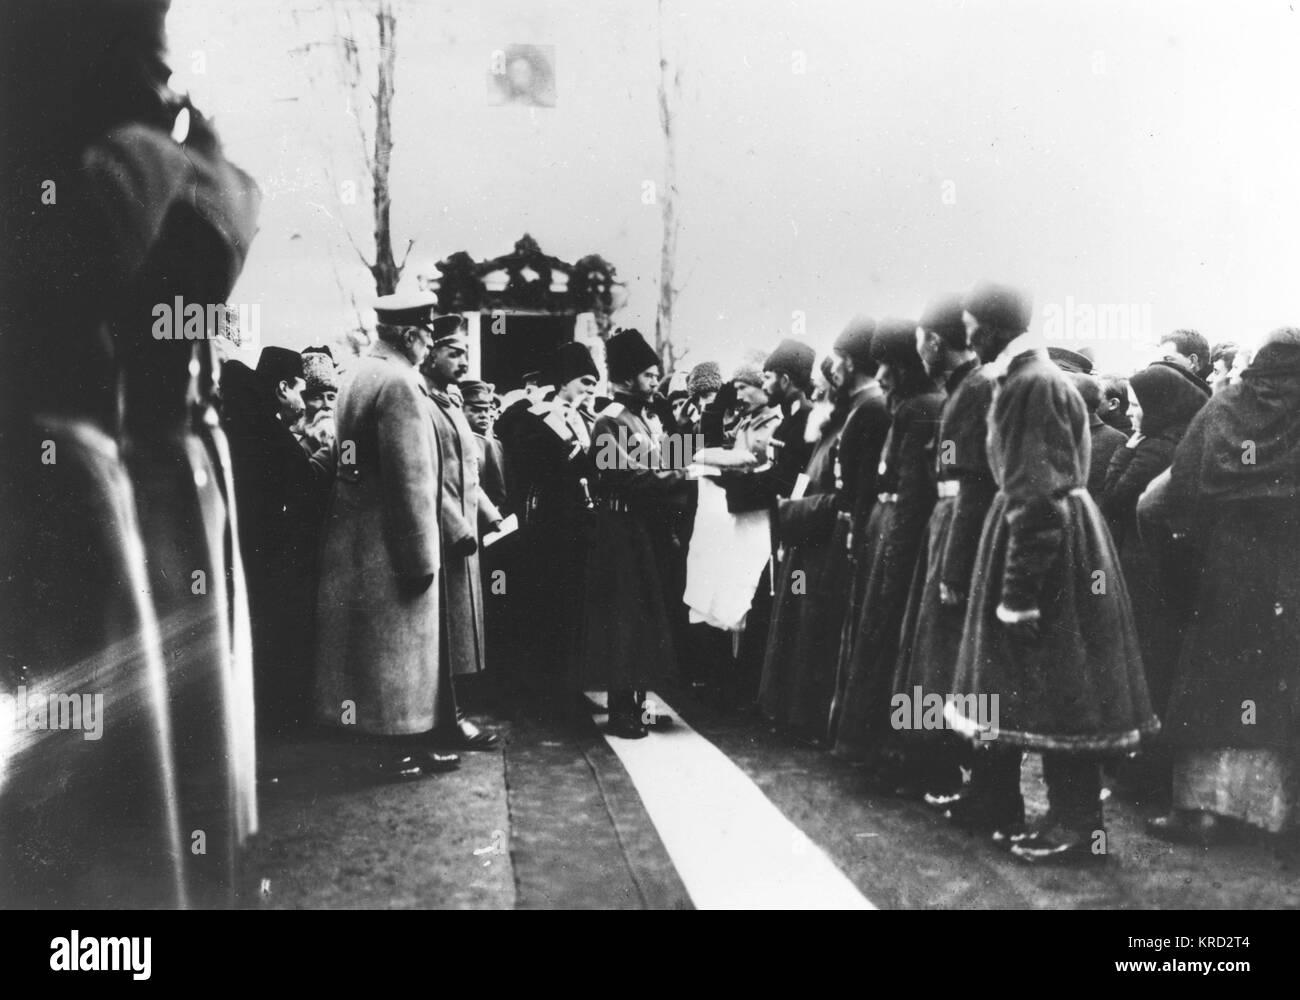 Tsar Nicholas II performs official duties in Vladikavkaz     Date: circa 1900 - Stock Image